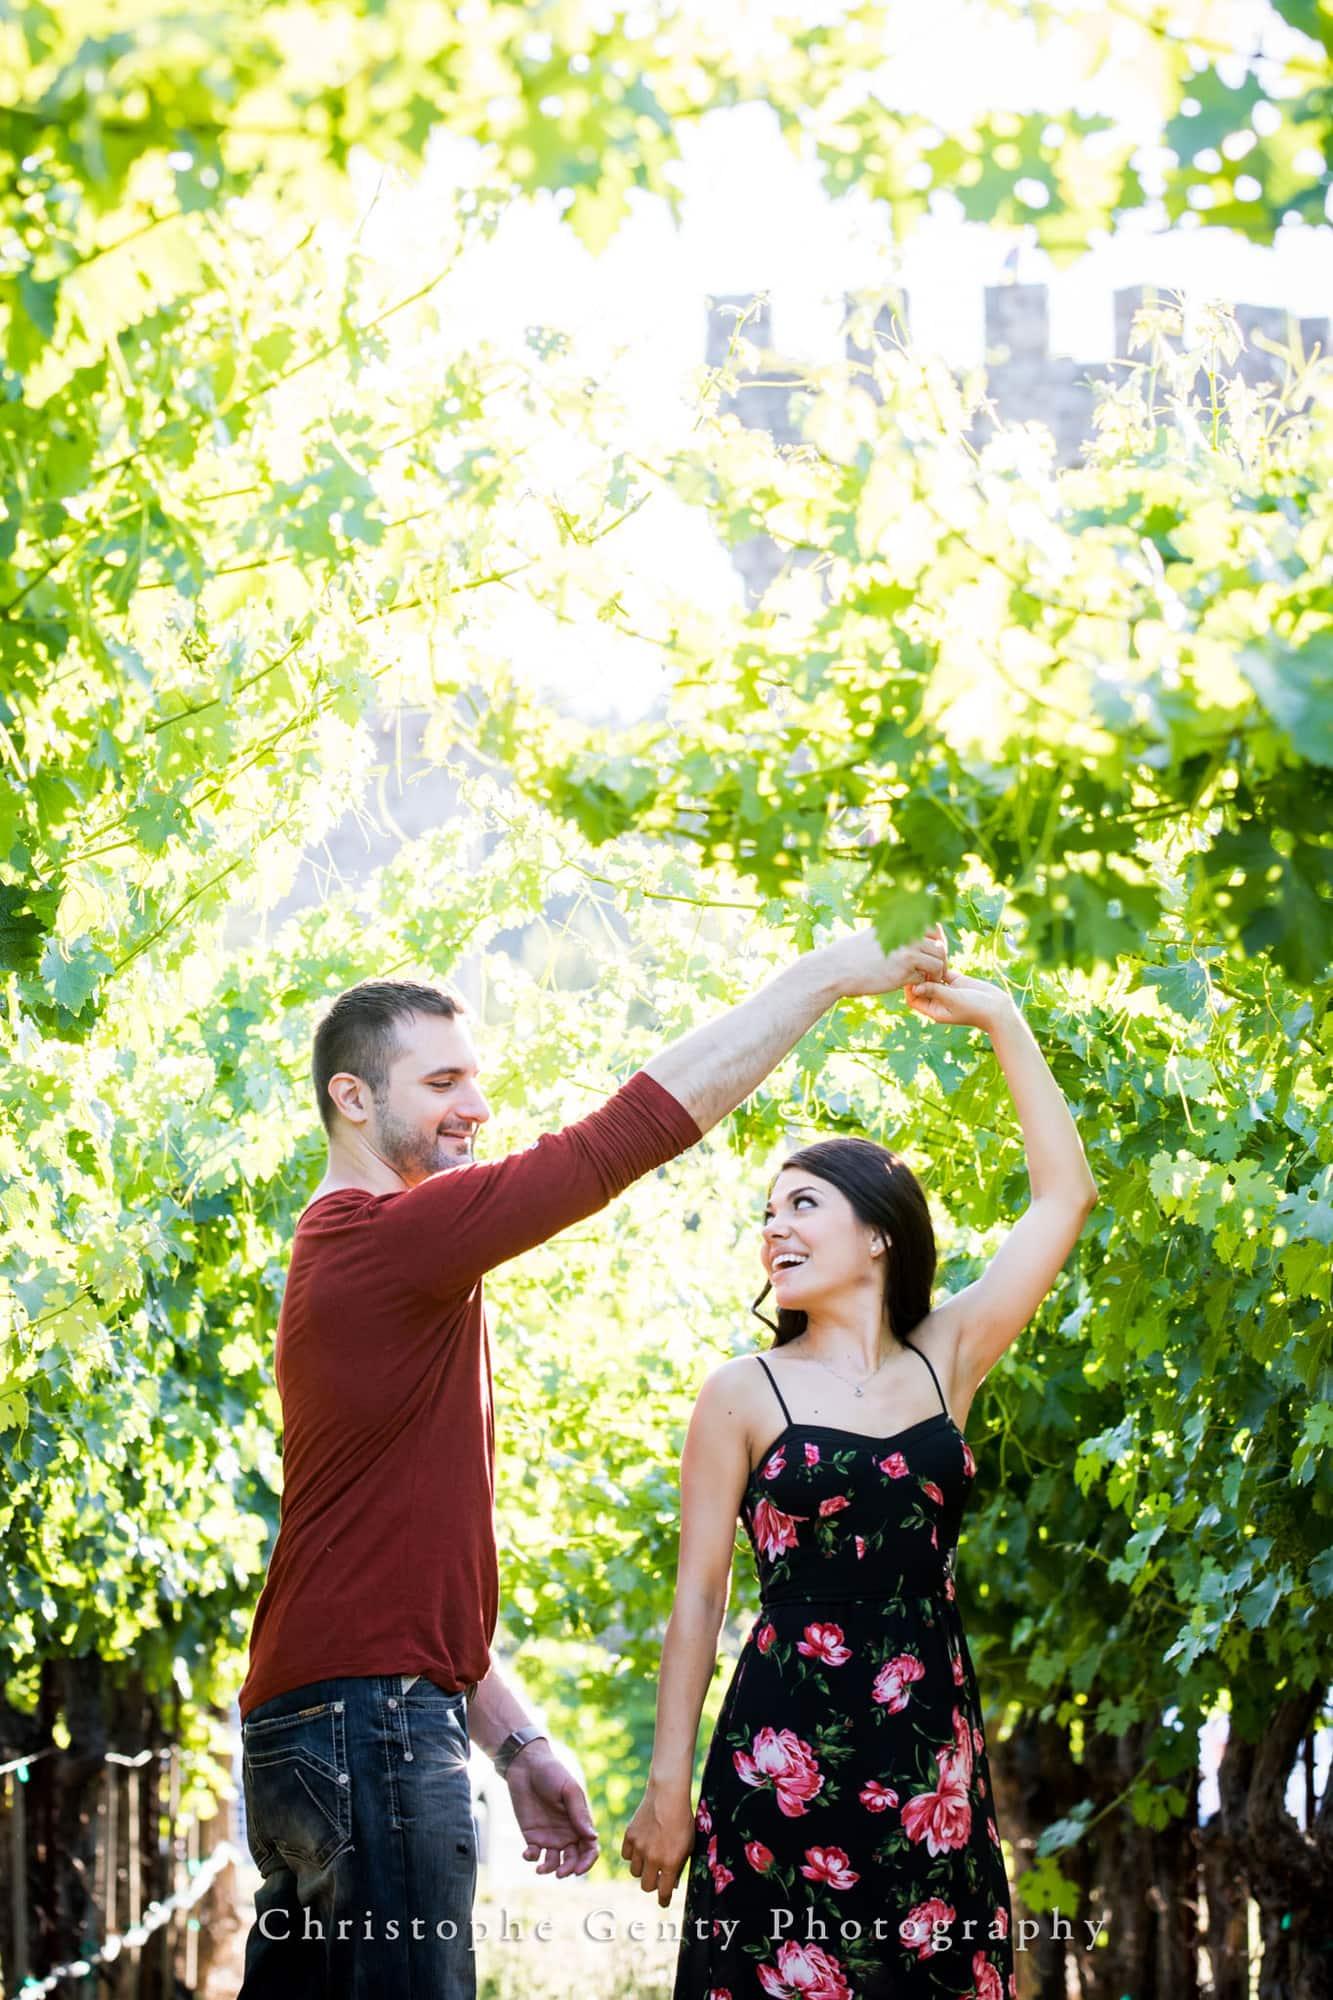 Castello di Amorosa Marriage Proposal Photography 353